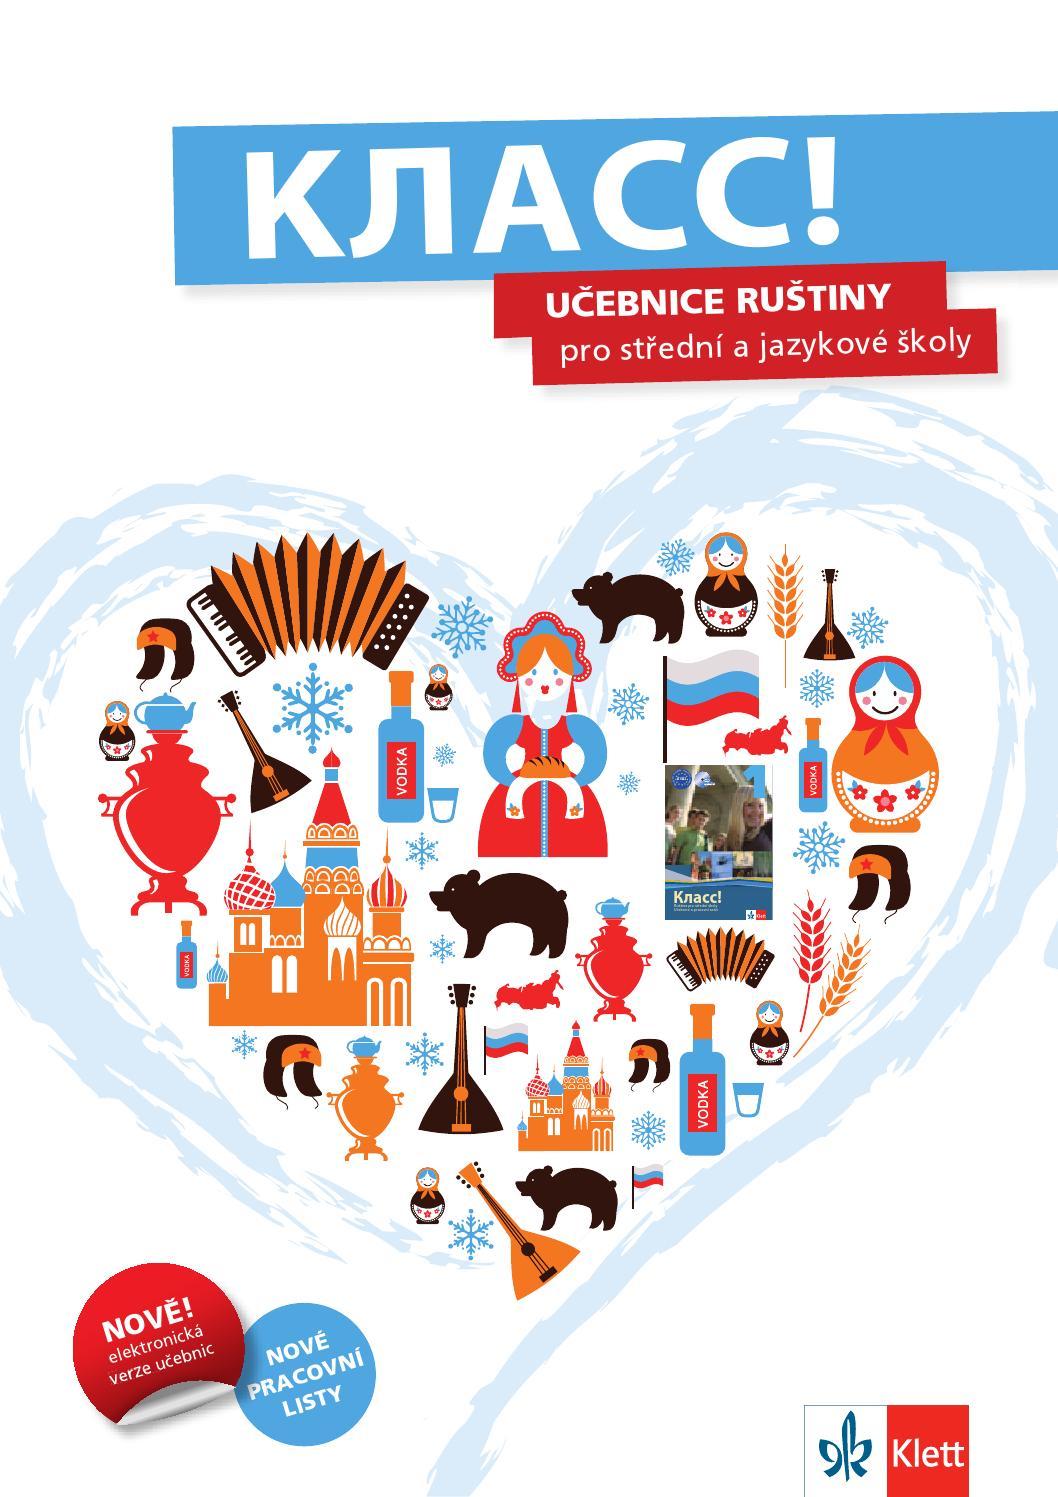 Brochure Raf Klass Secondary Mar 2014 Cze By Zalozba Rokus Klett